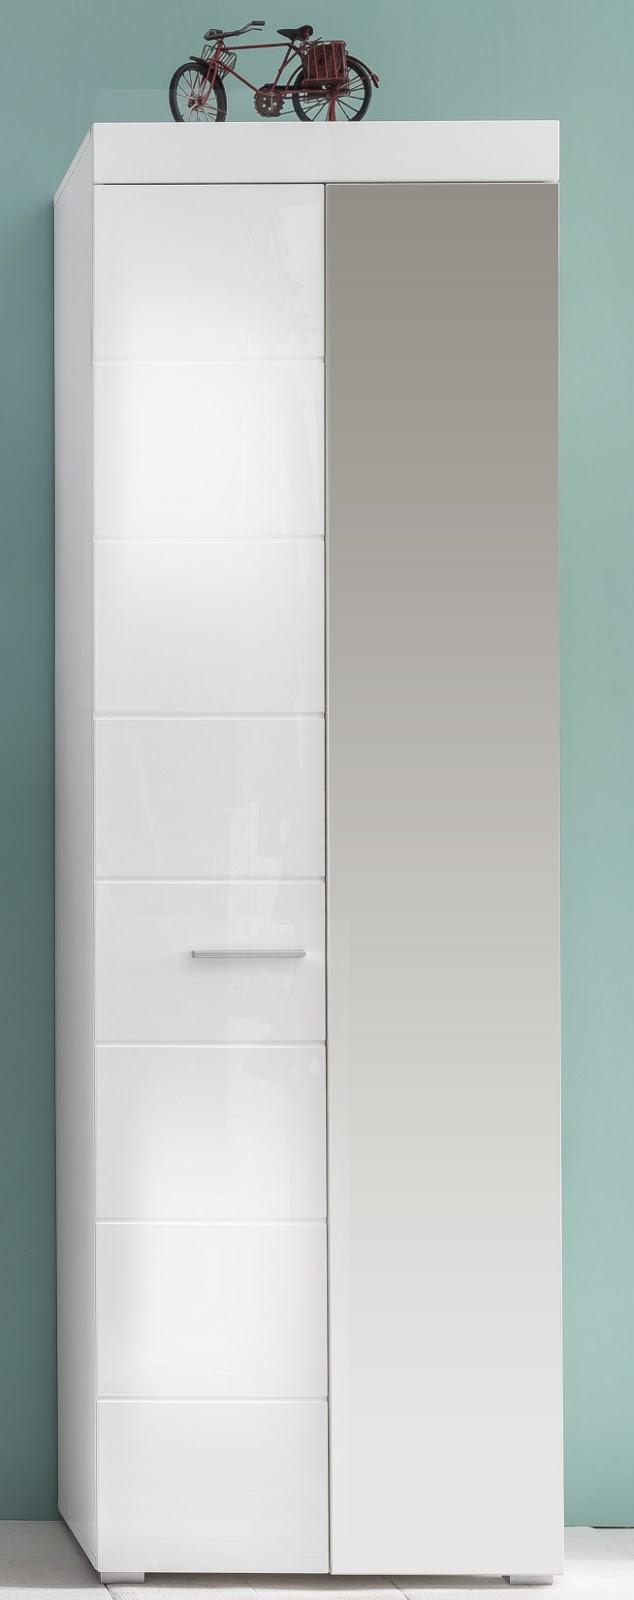 garderobe amanda ge1177 14. Black Bedroom Furniture Sets. Home Design Ideas